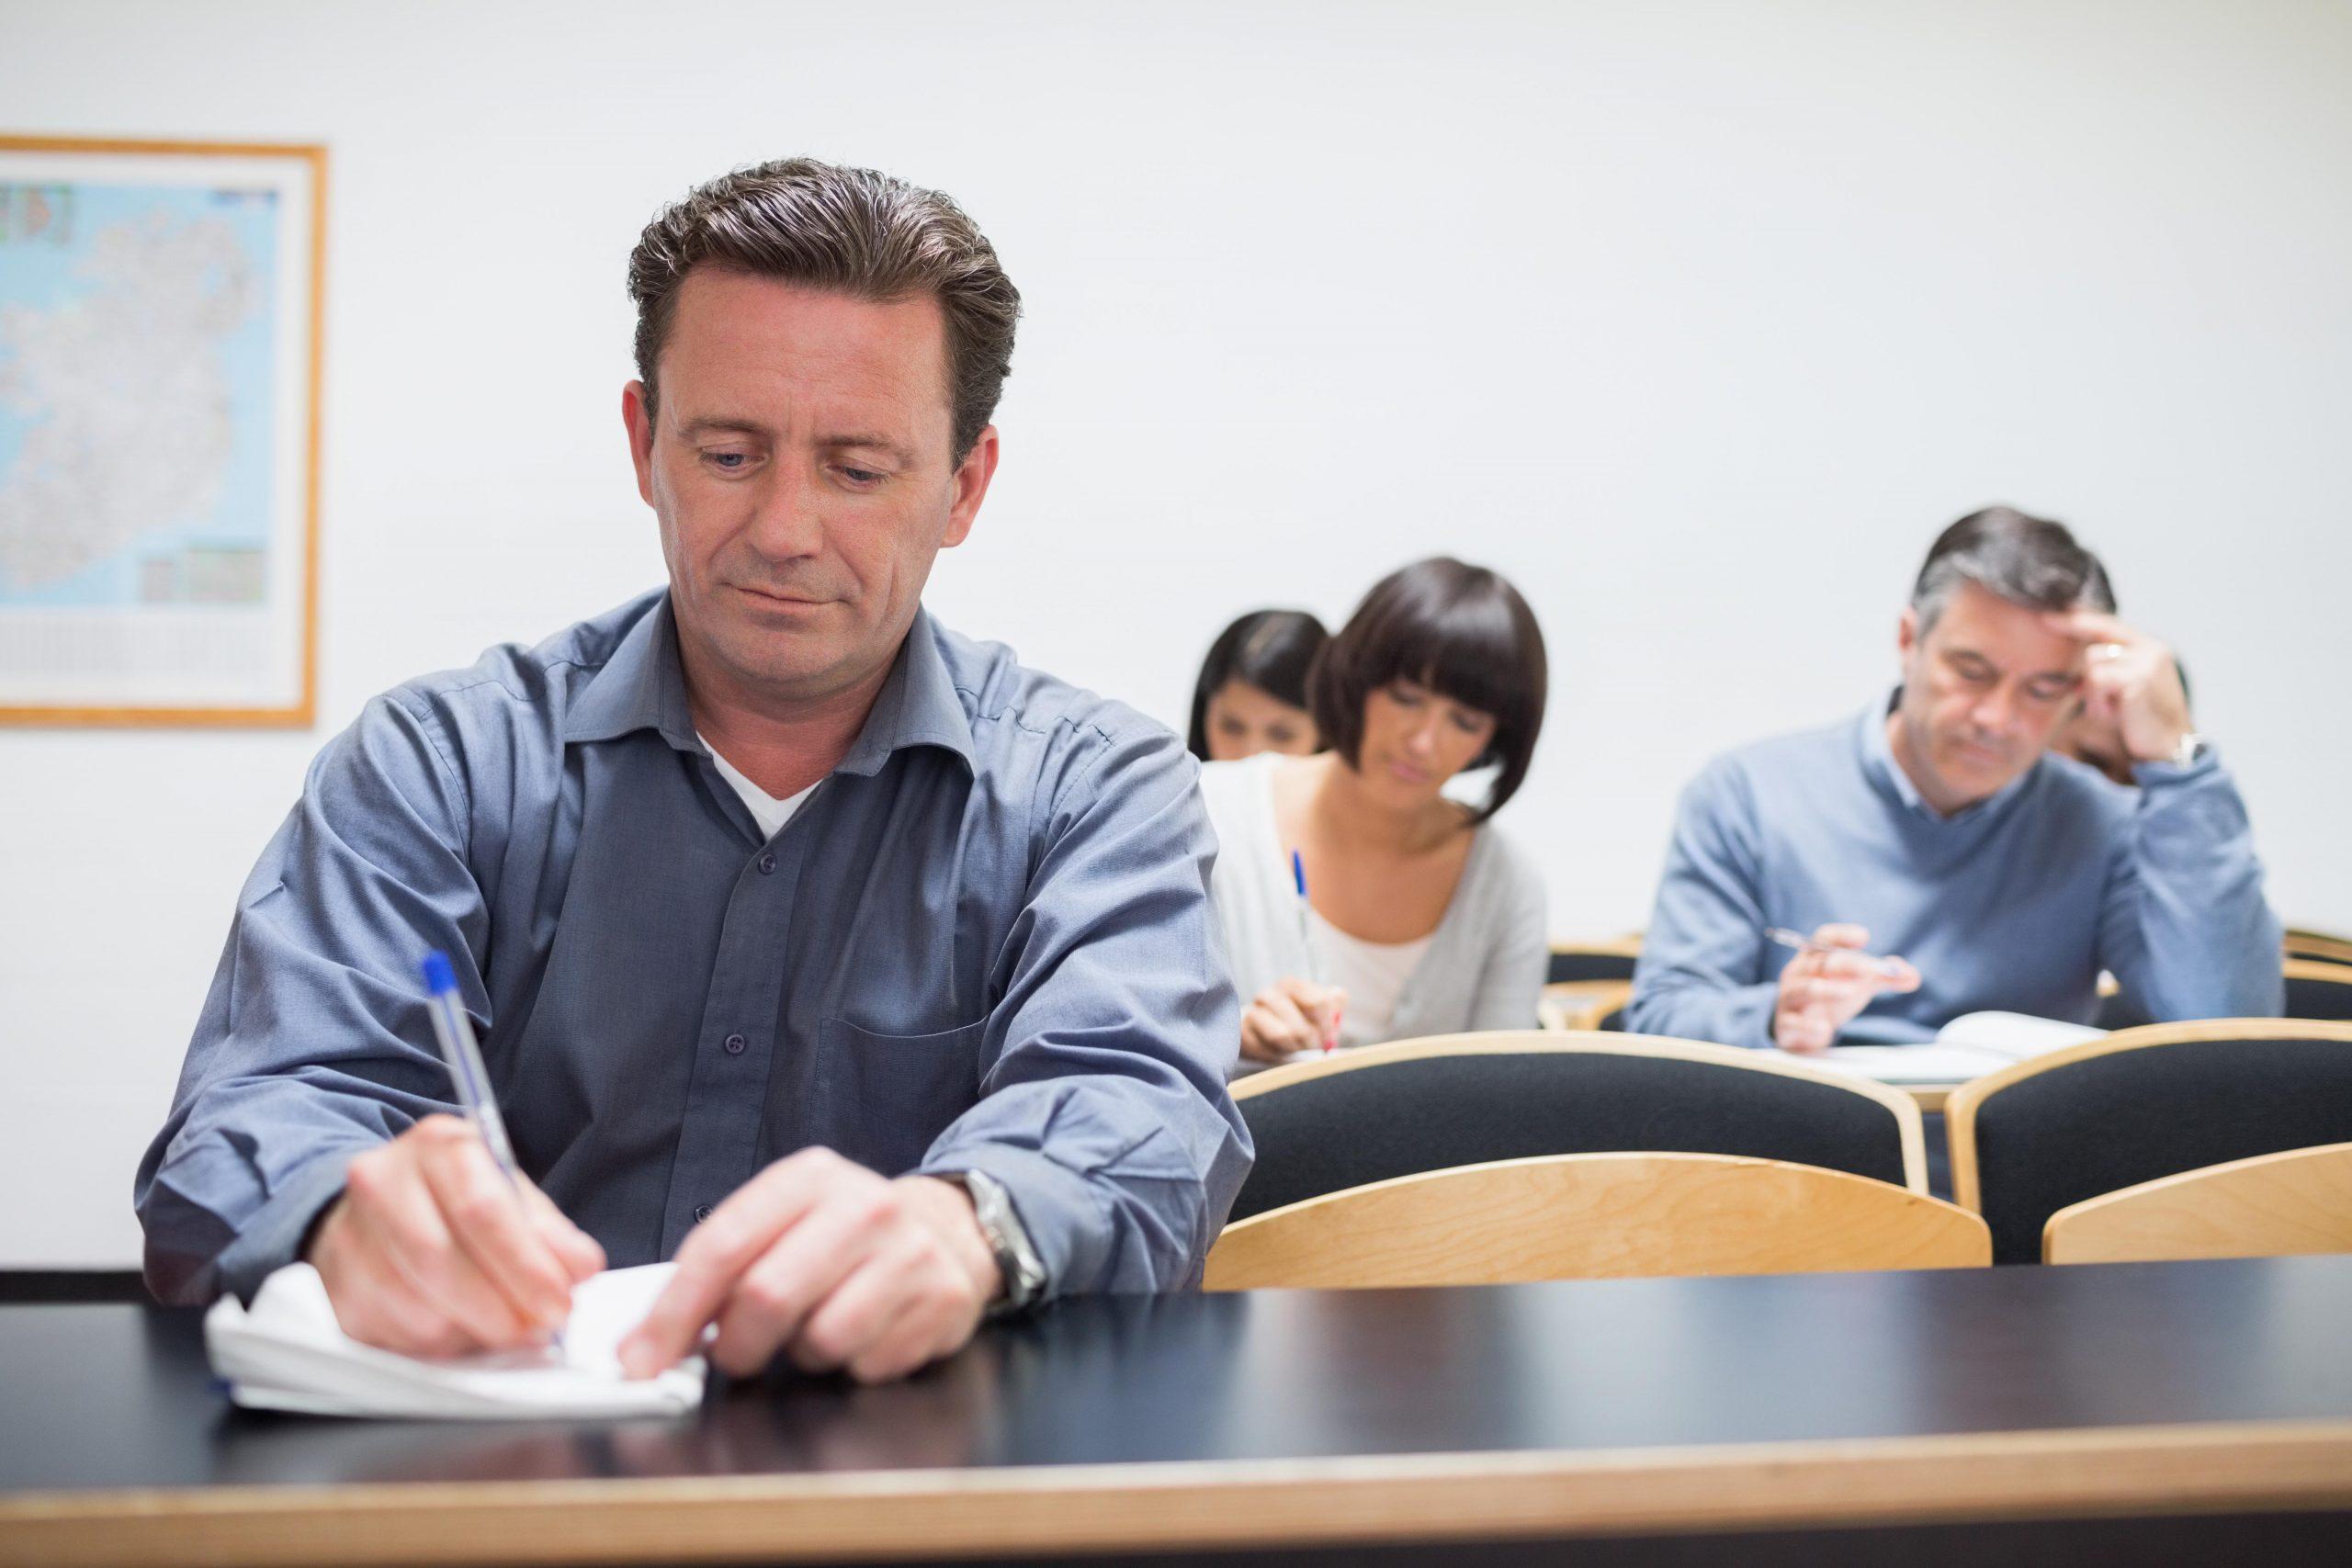 Adult Classroom Driver Education